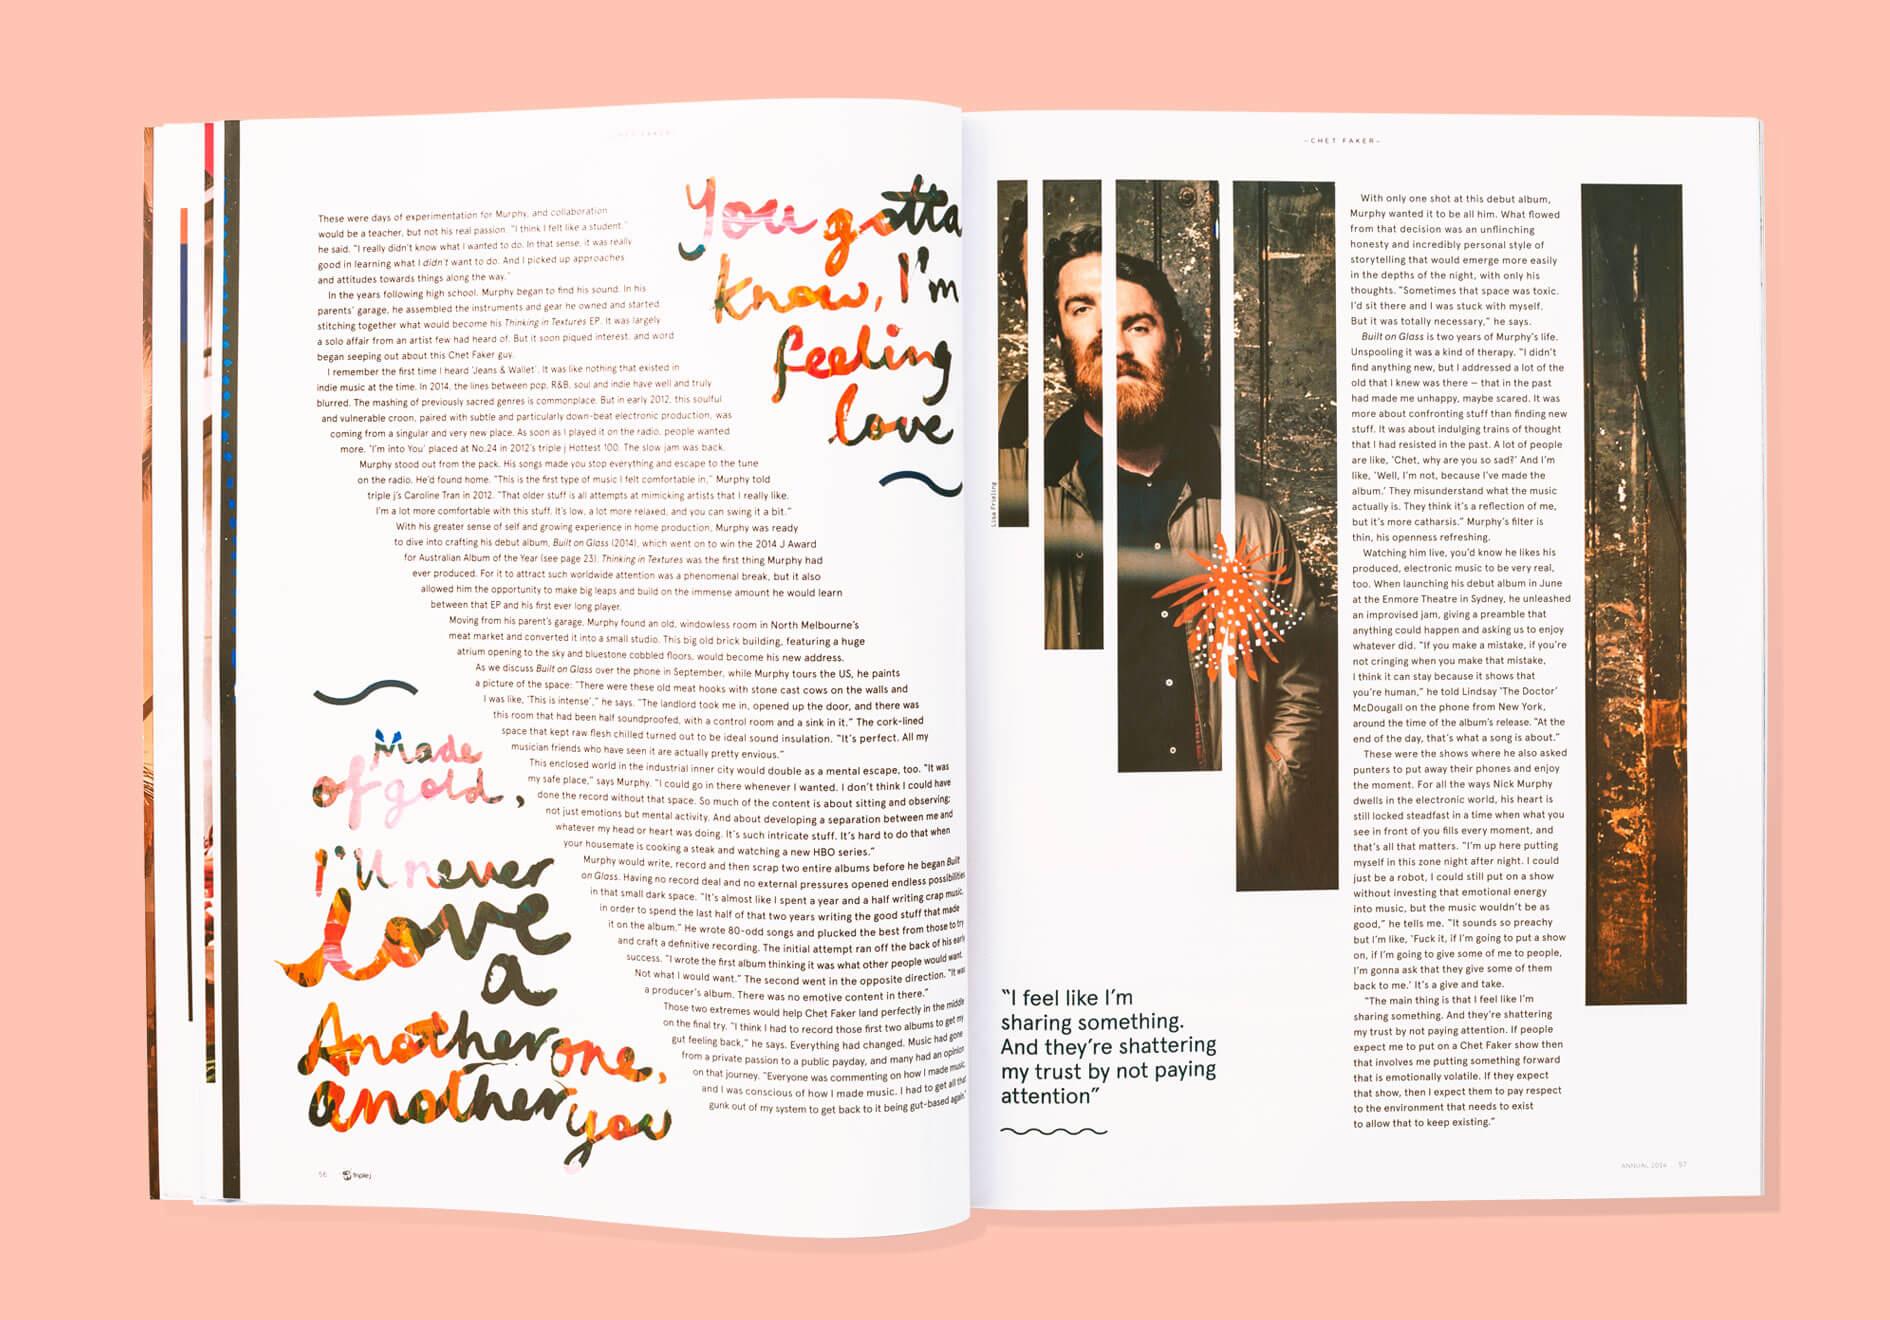 NatCarroll_triplej_Annual_2014_Magazine_ChetFakerSpread_10col